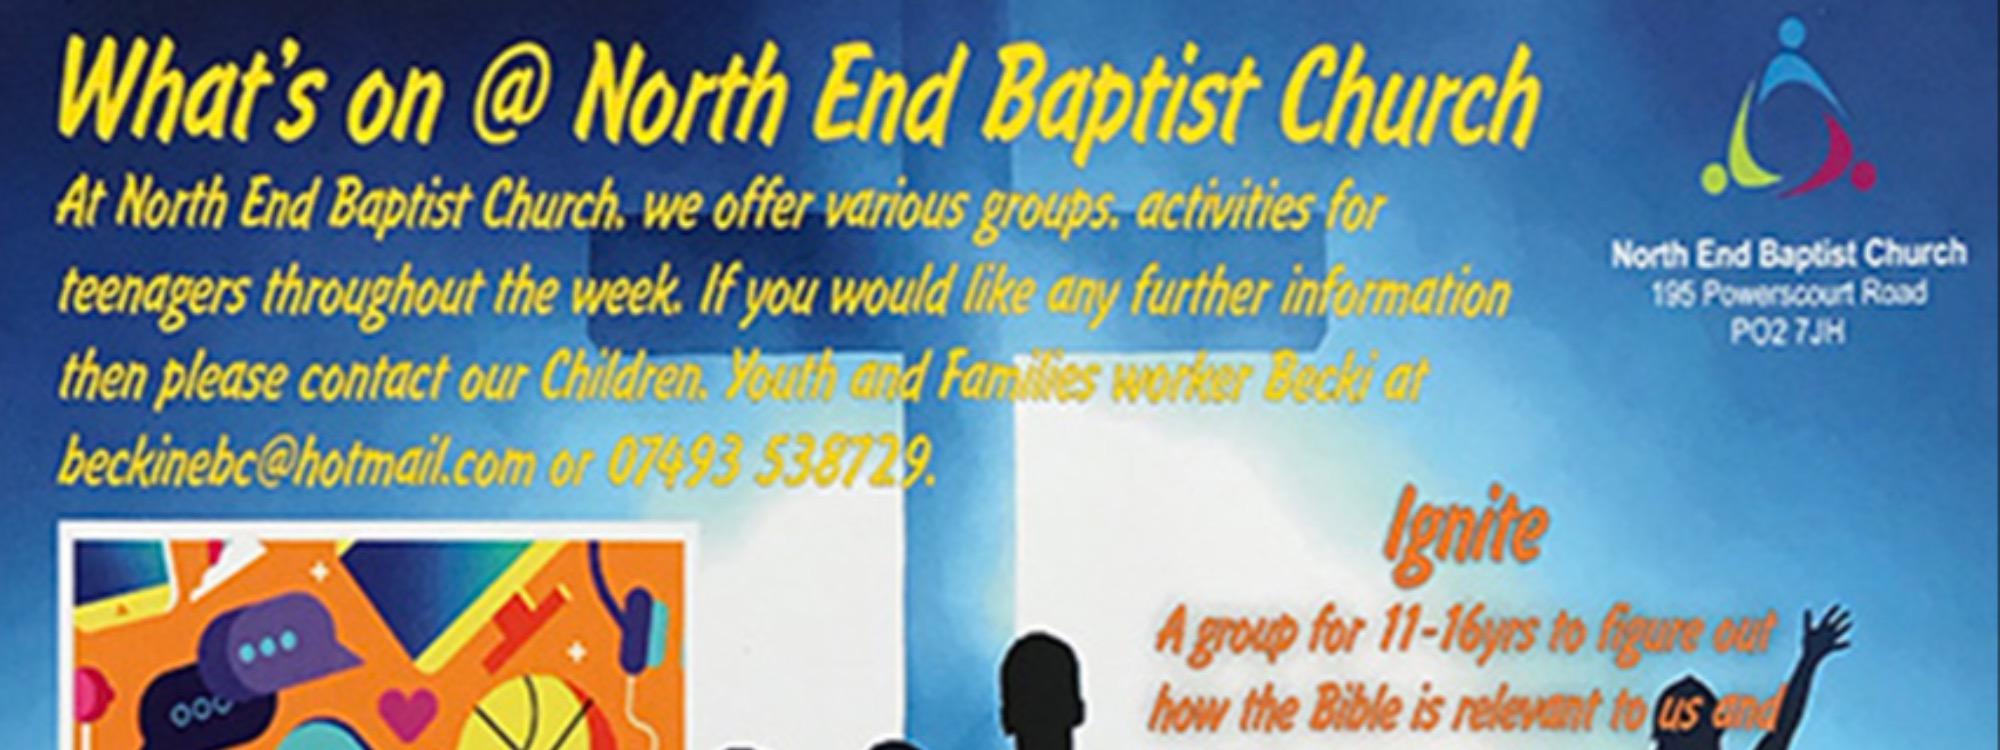 North End Baptist Church : North End Baptist